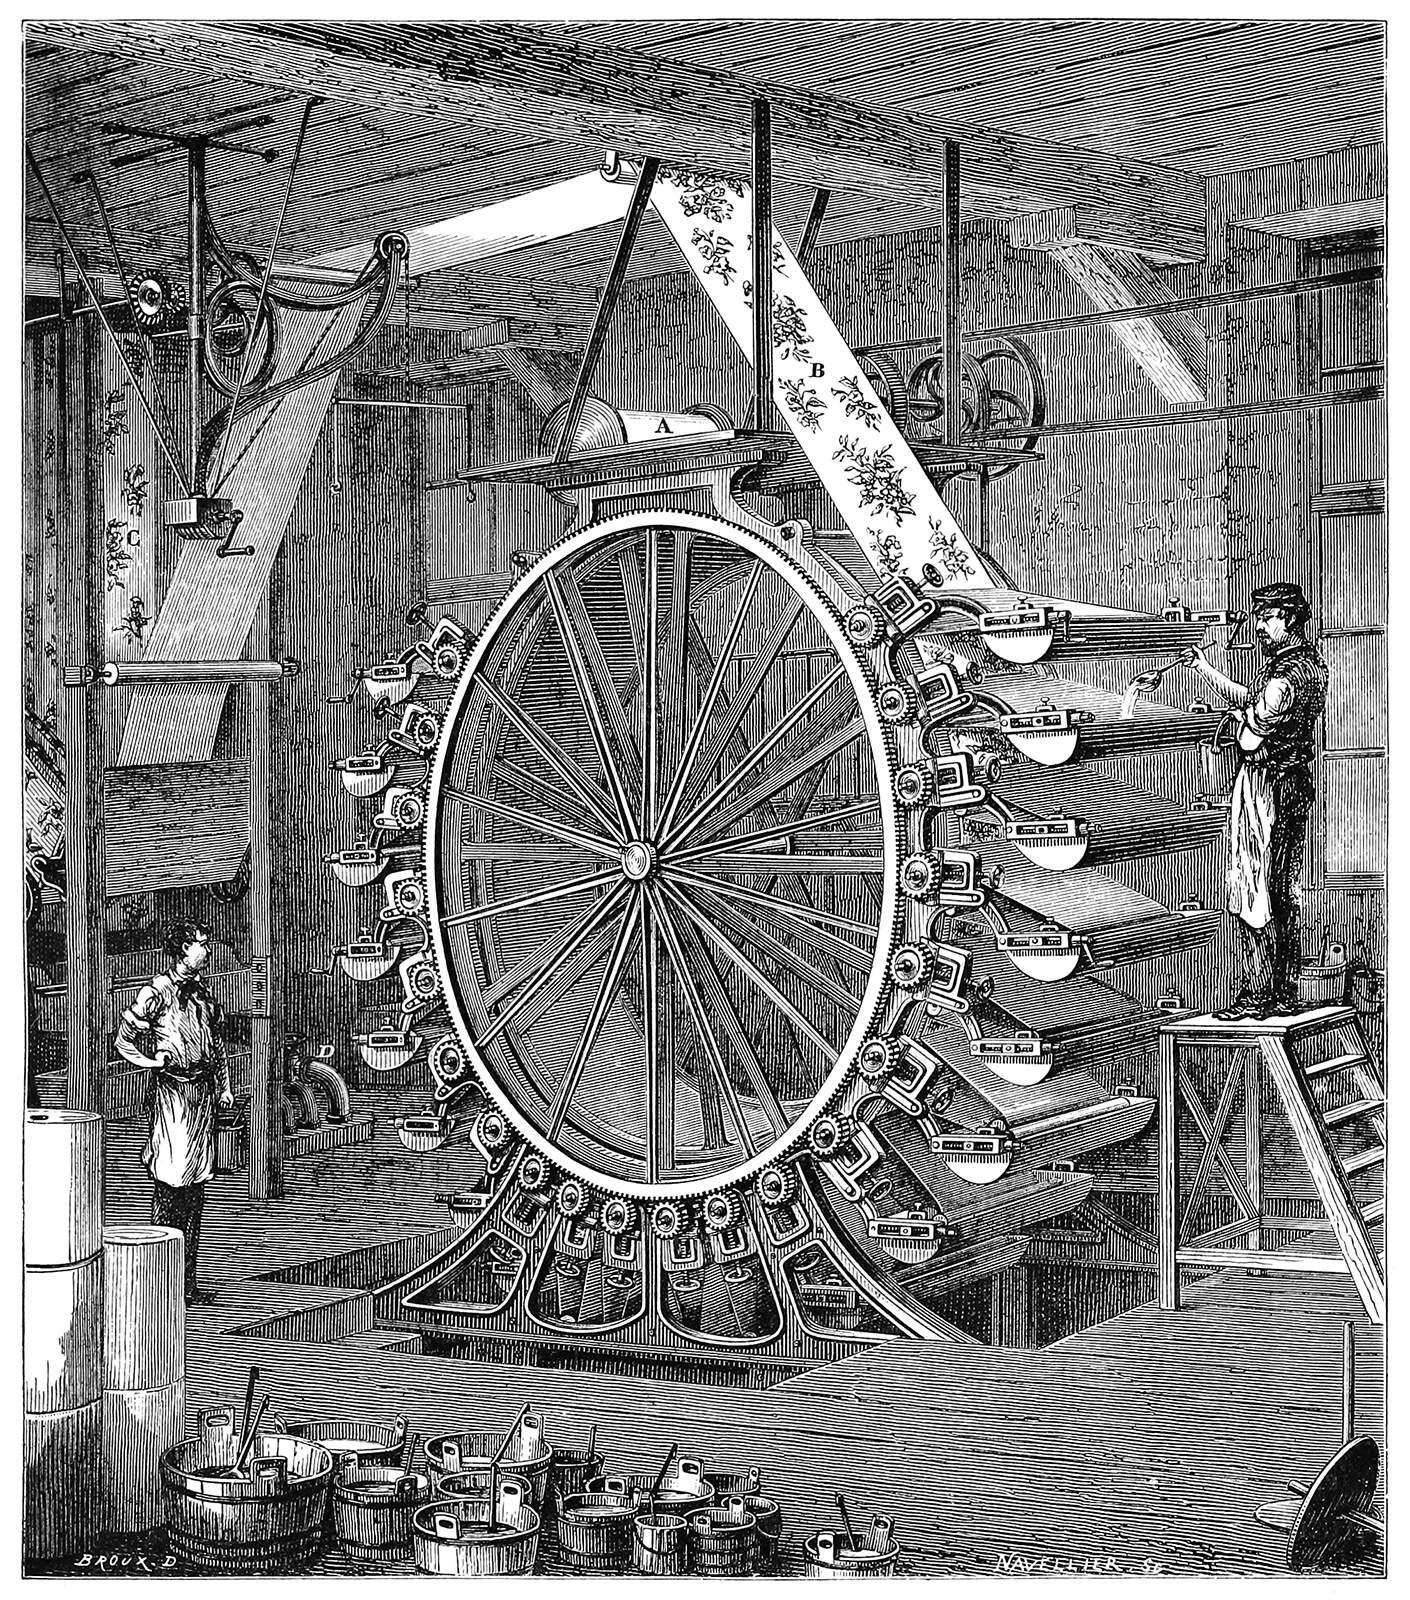 An enormous wallpaper printing machine